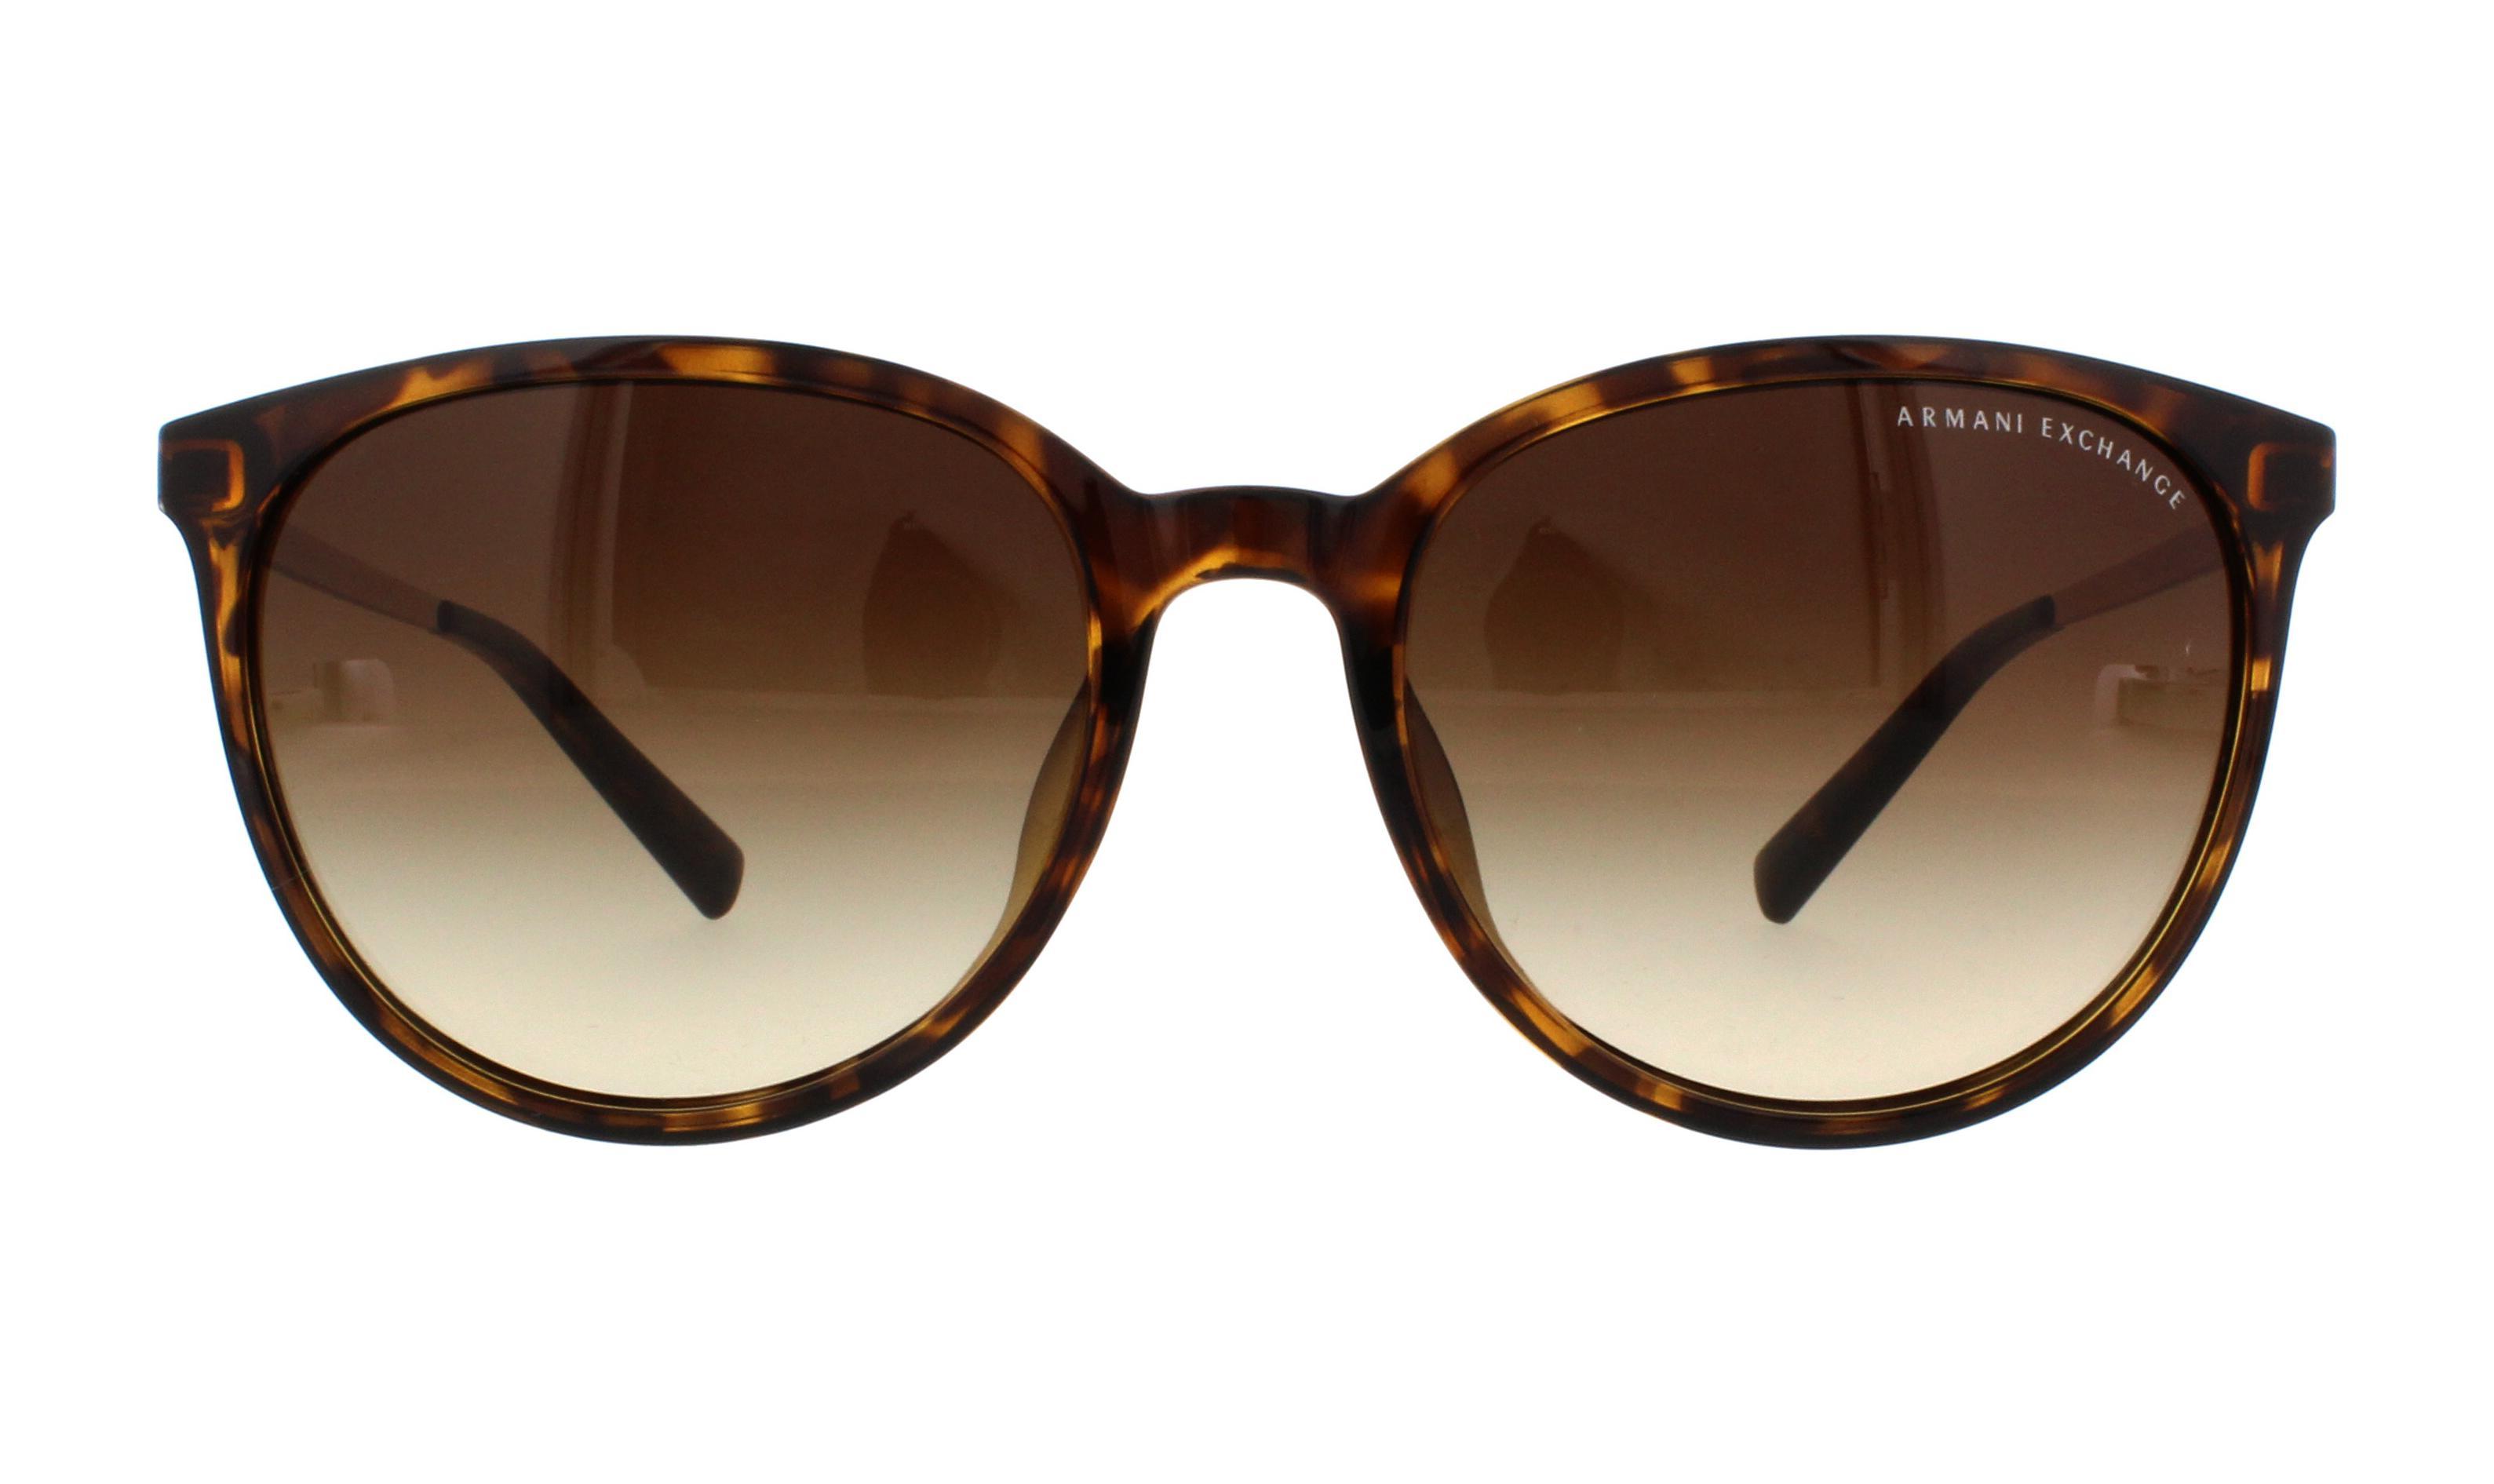 22a001ef8405 Armani Exchange Sunglasses Repair « One More Soul